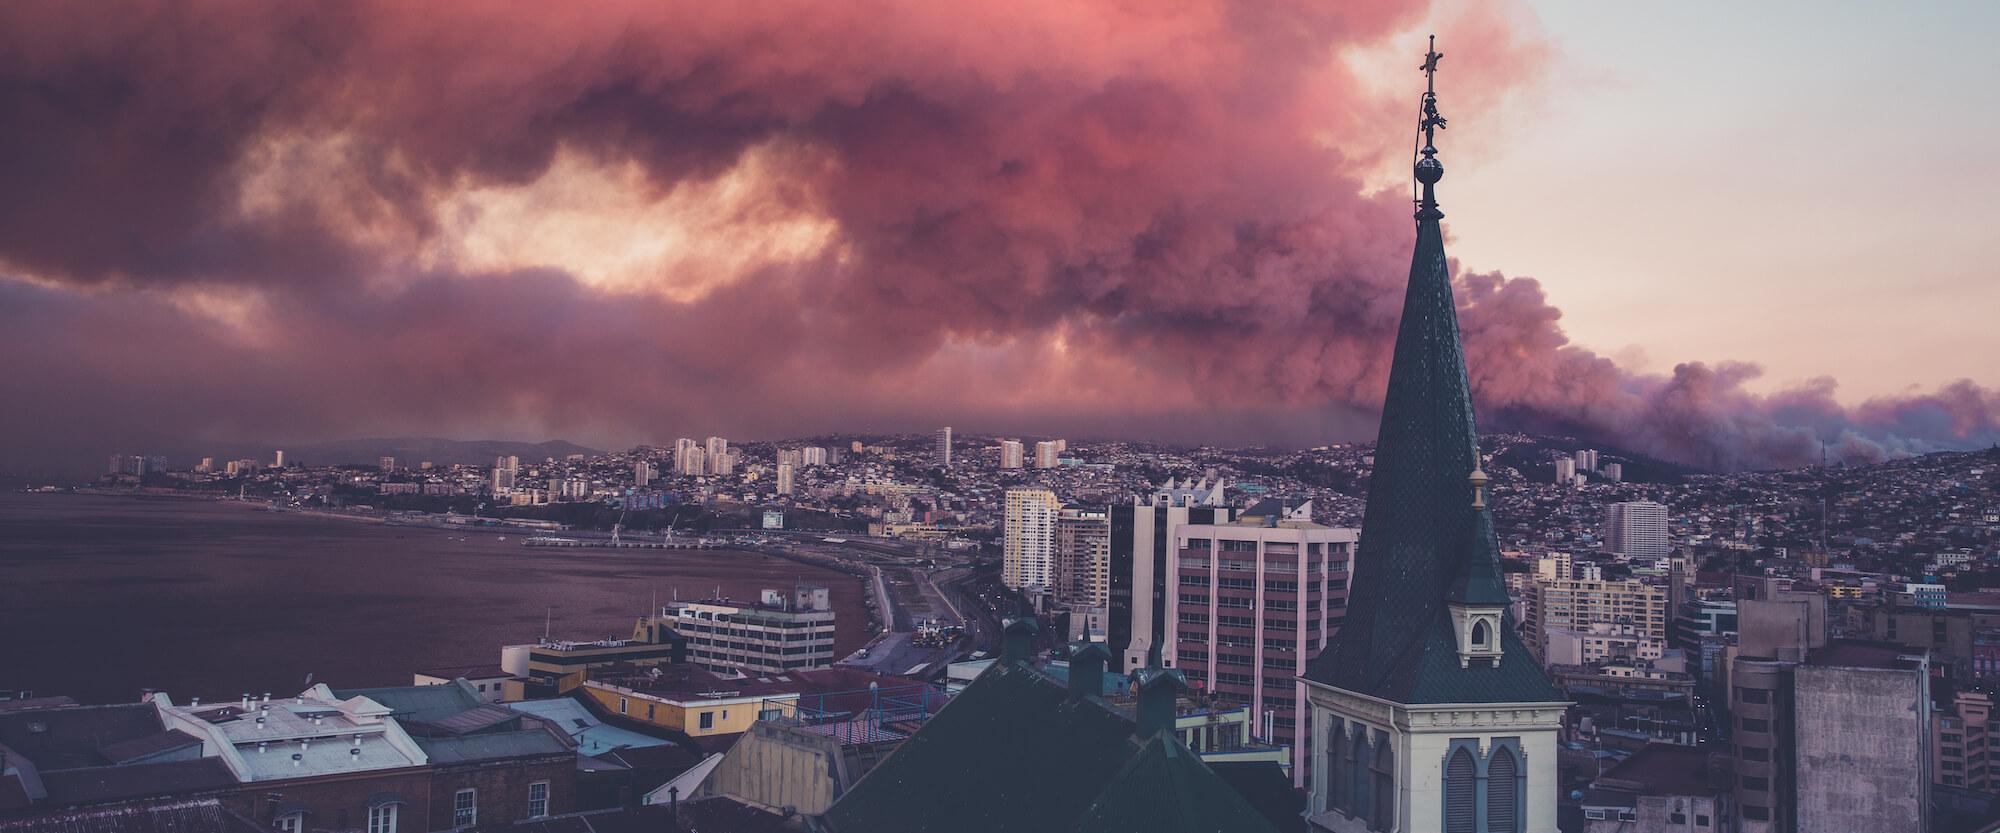 Smoke rising across Western City